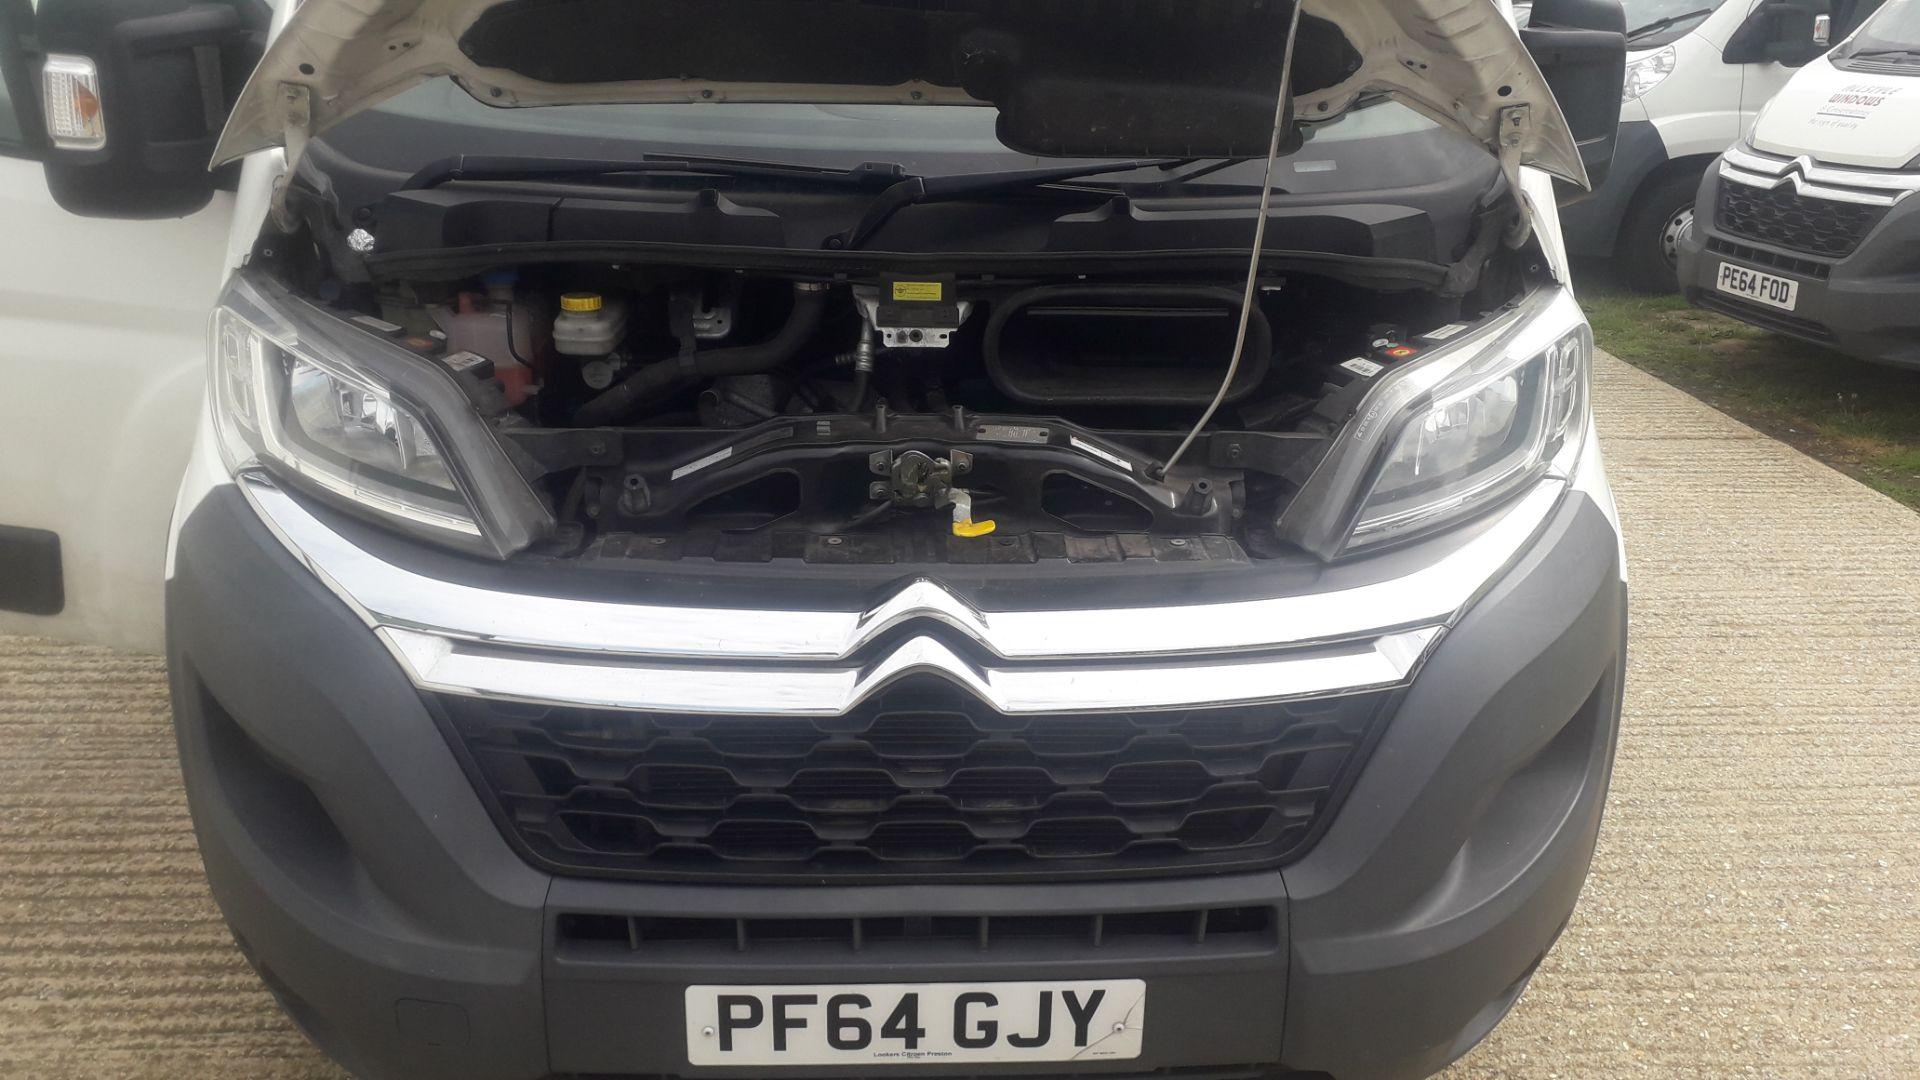 Lot 1 - Citroen Relay 35 Diesel 2.2HDi H2 130PS Enterprise